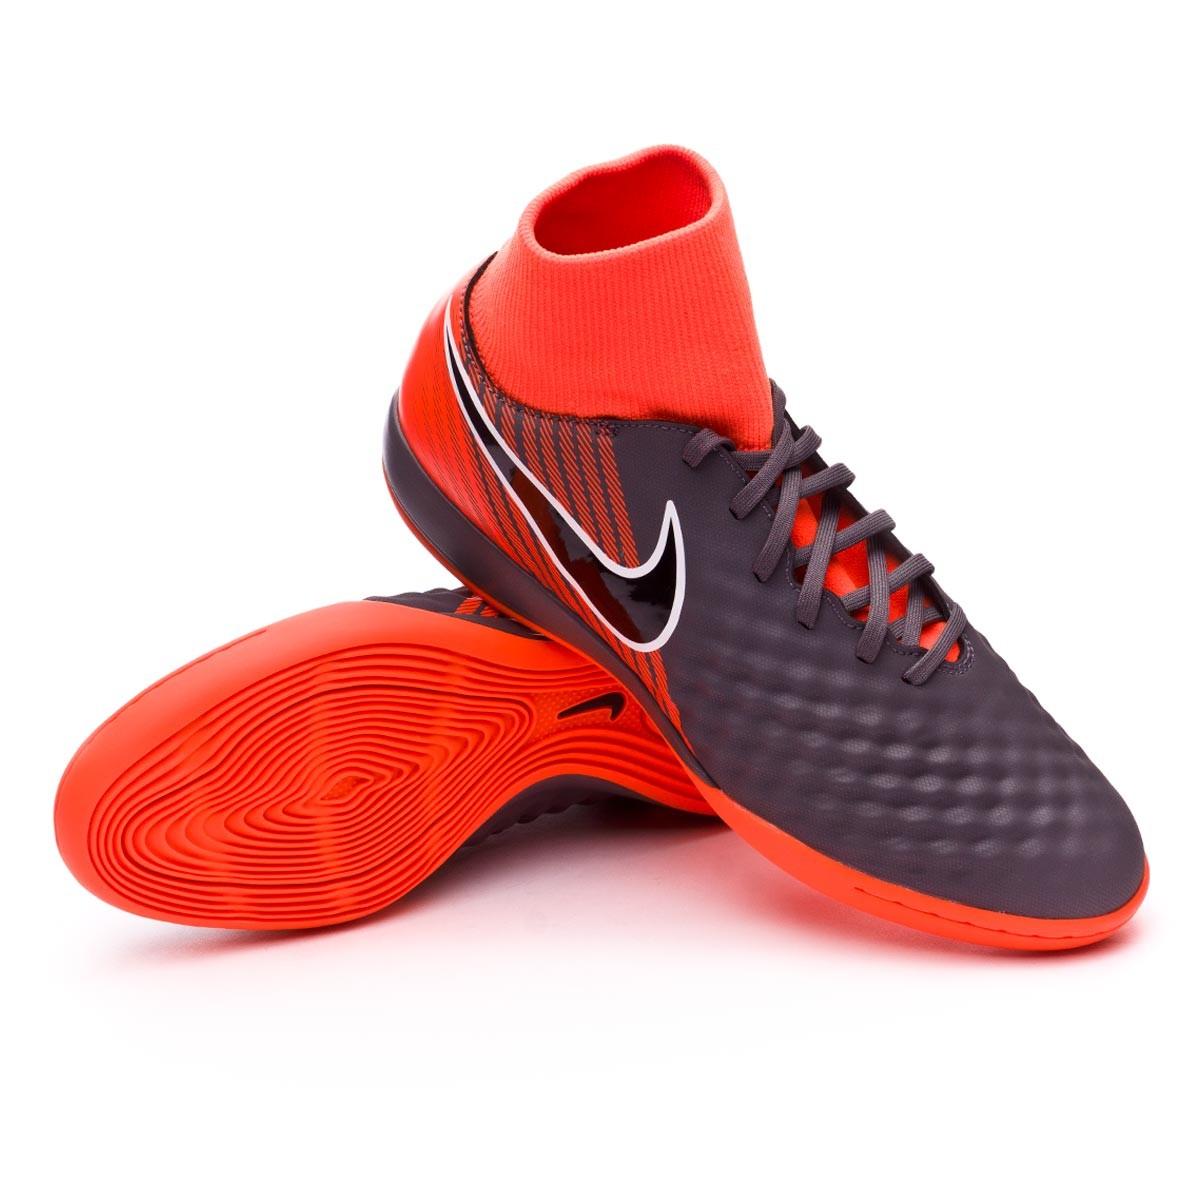 Nike OBRAX 3 Academy DF IC - Scarpe da ginnastica, BLACK/BLACK-LT CRIMSON, 10